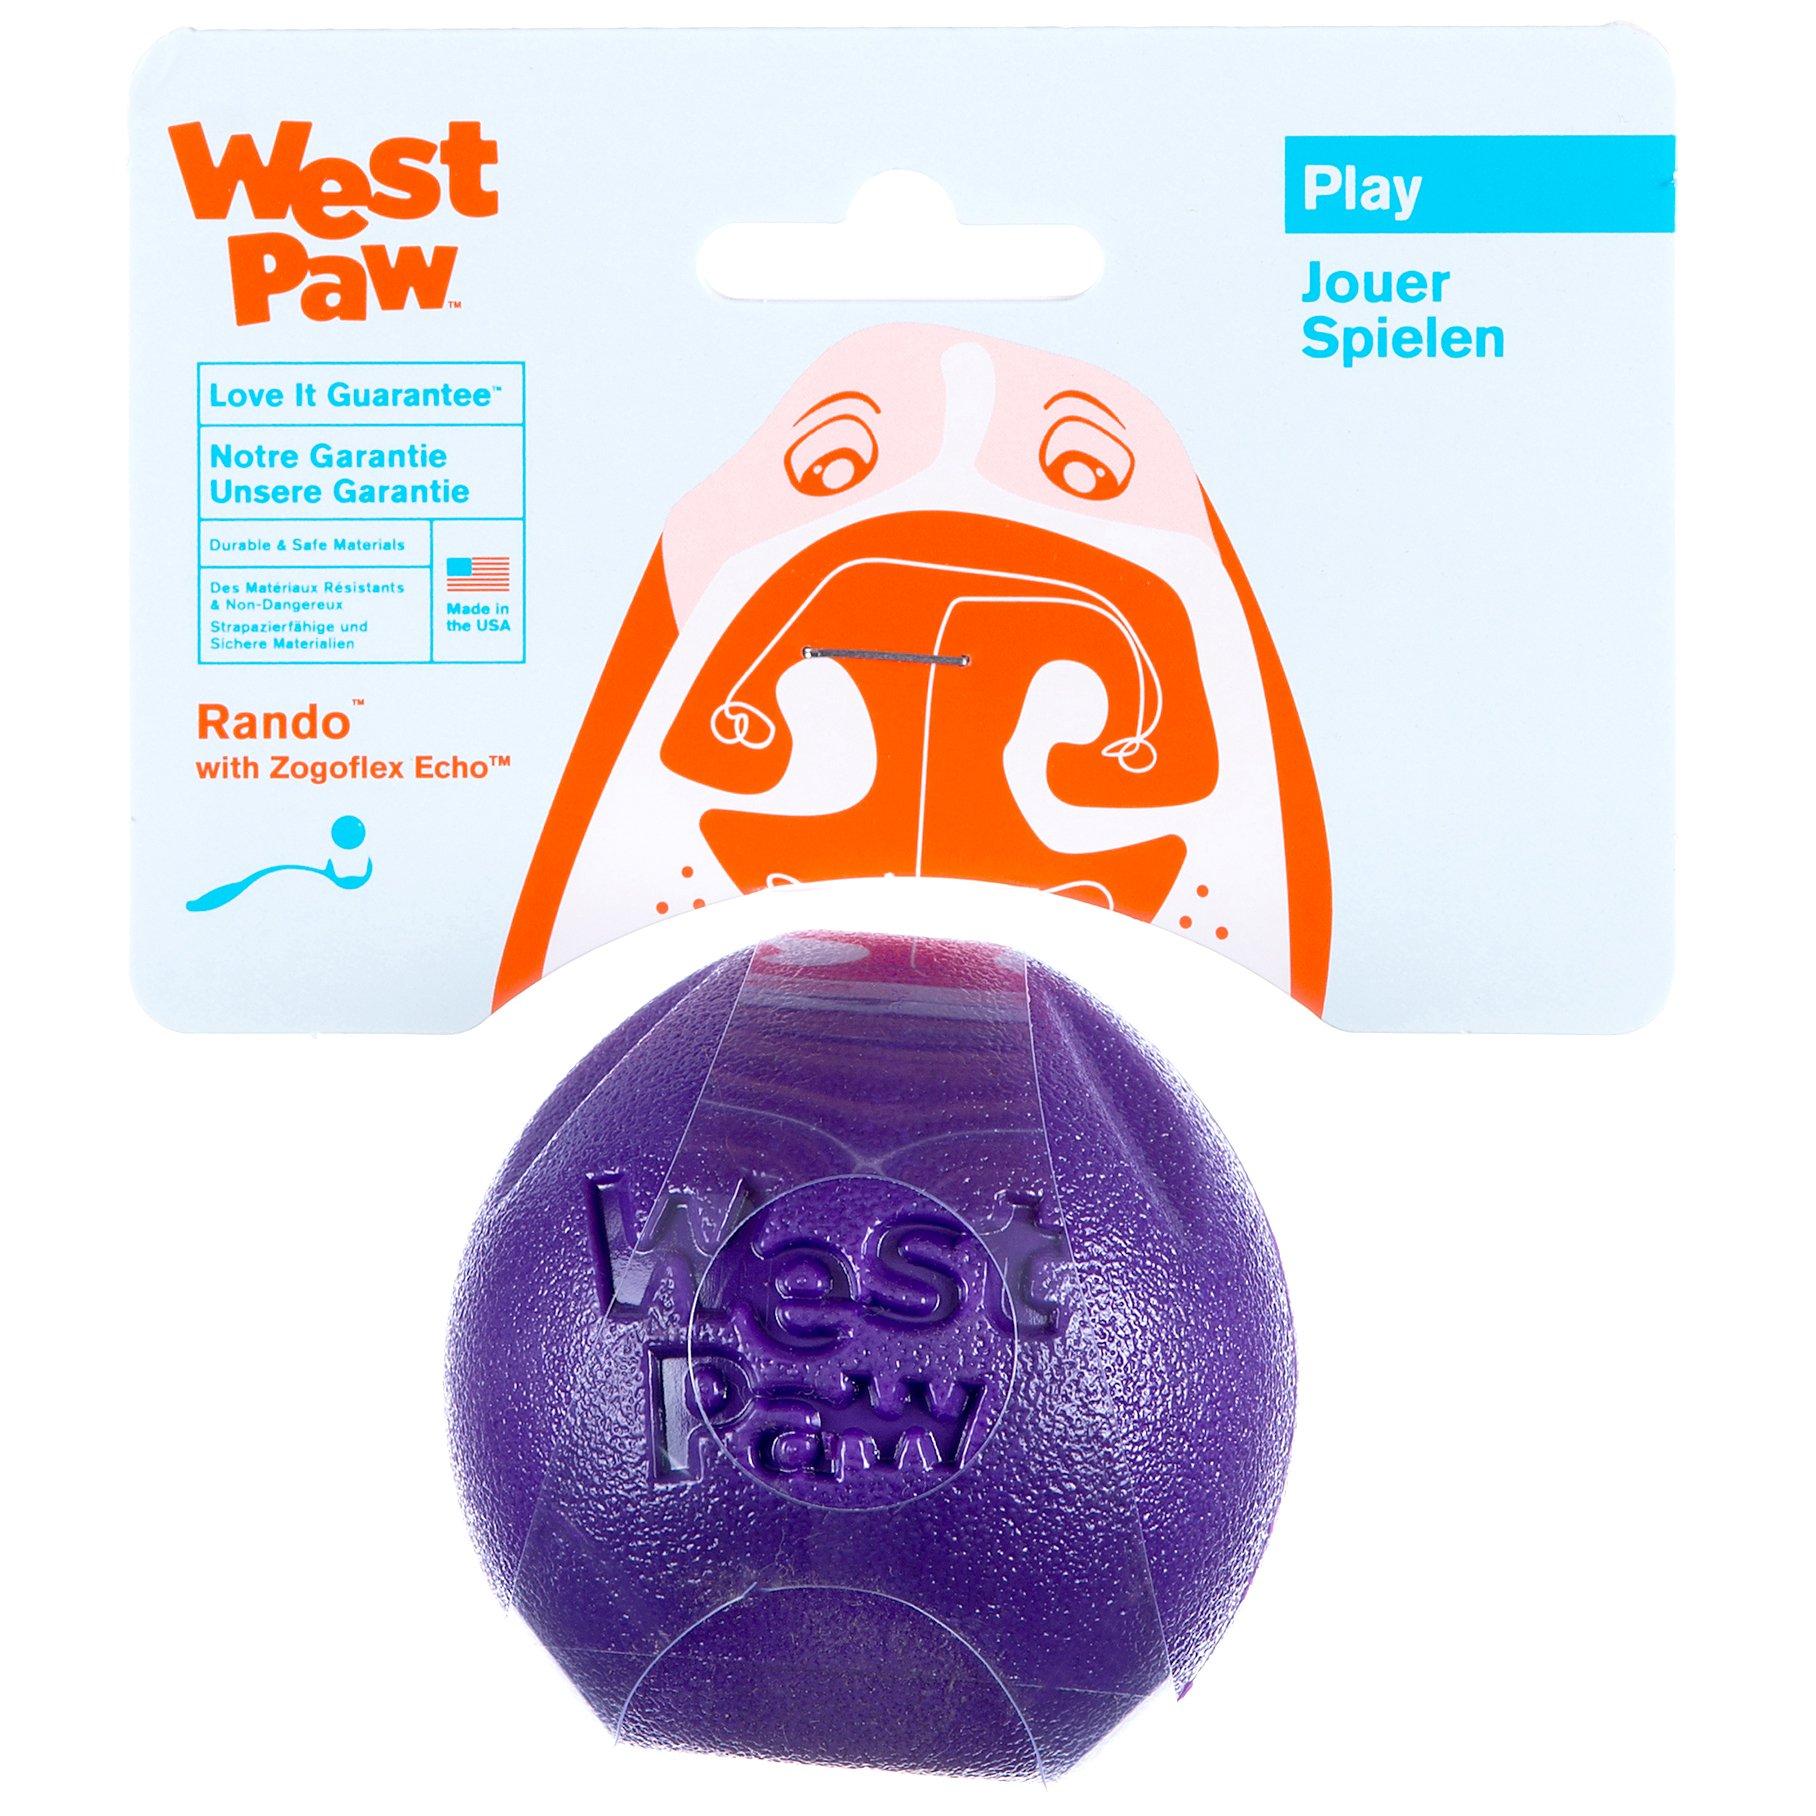 West Paw Rando Squeezy Dog Play Chew Ball Toy with Zogoflex Echo, Made in USA